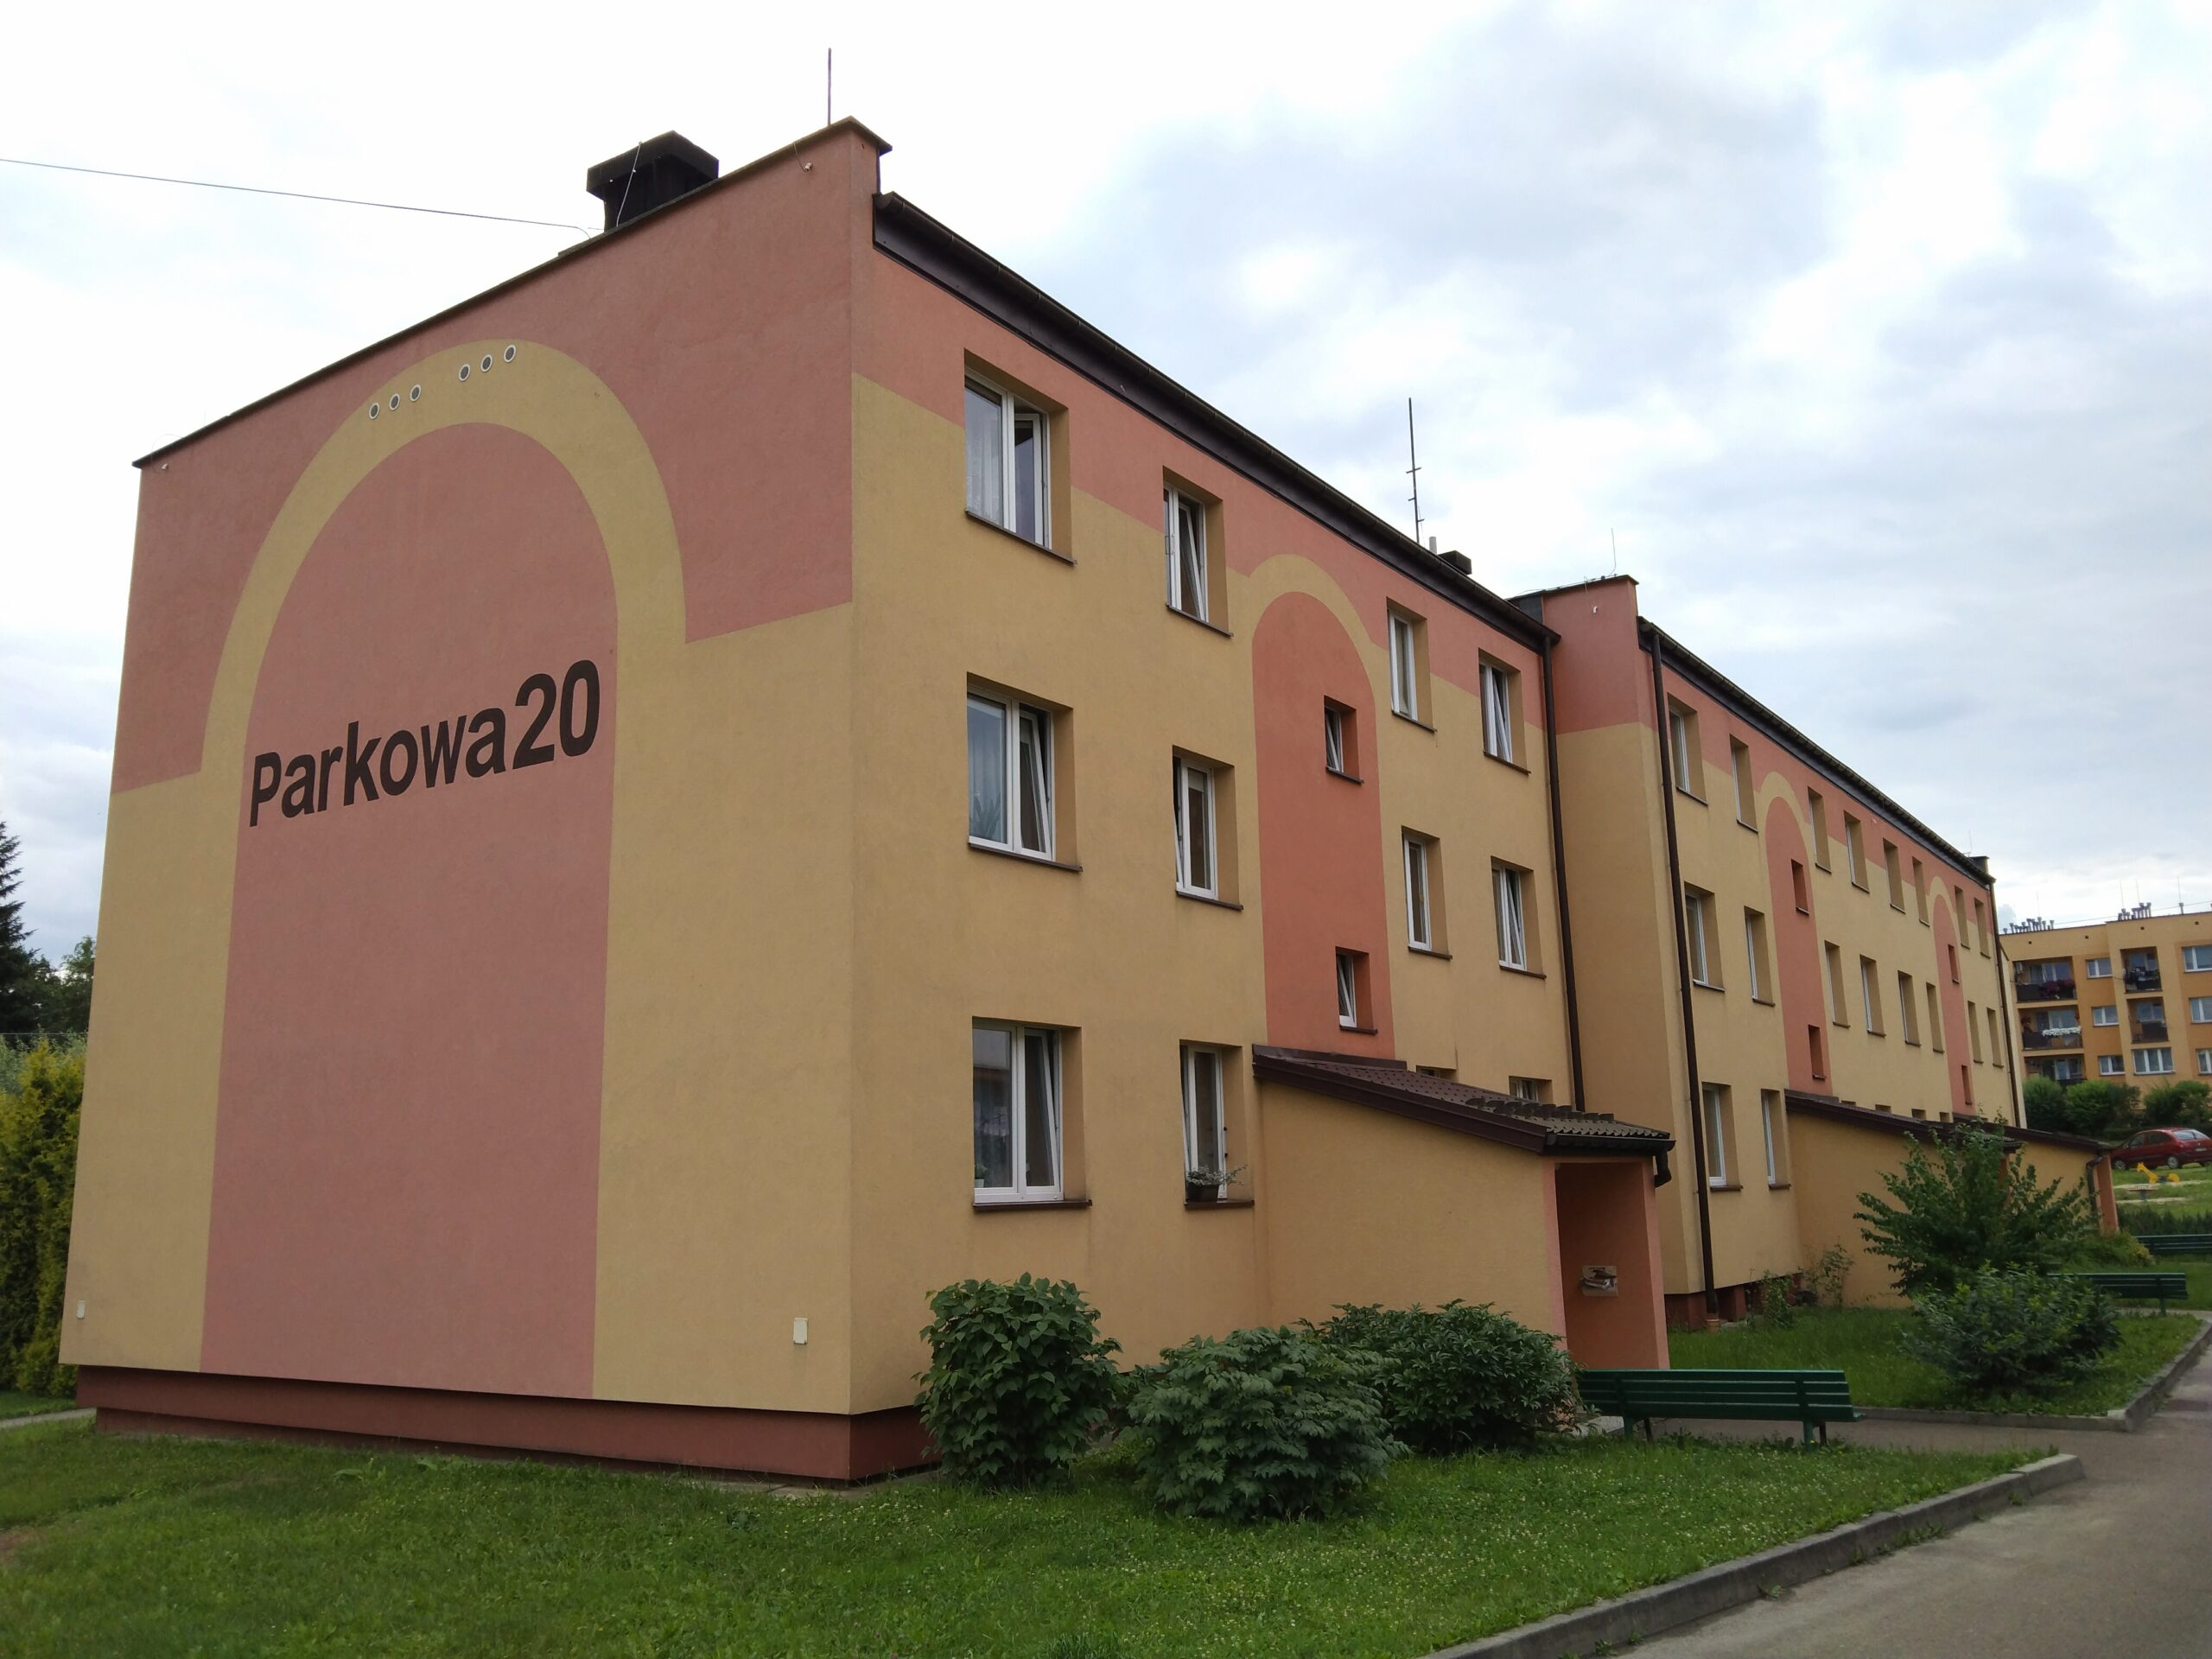 Parkowa 20